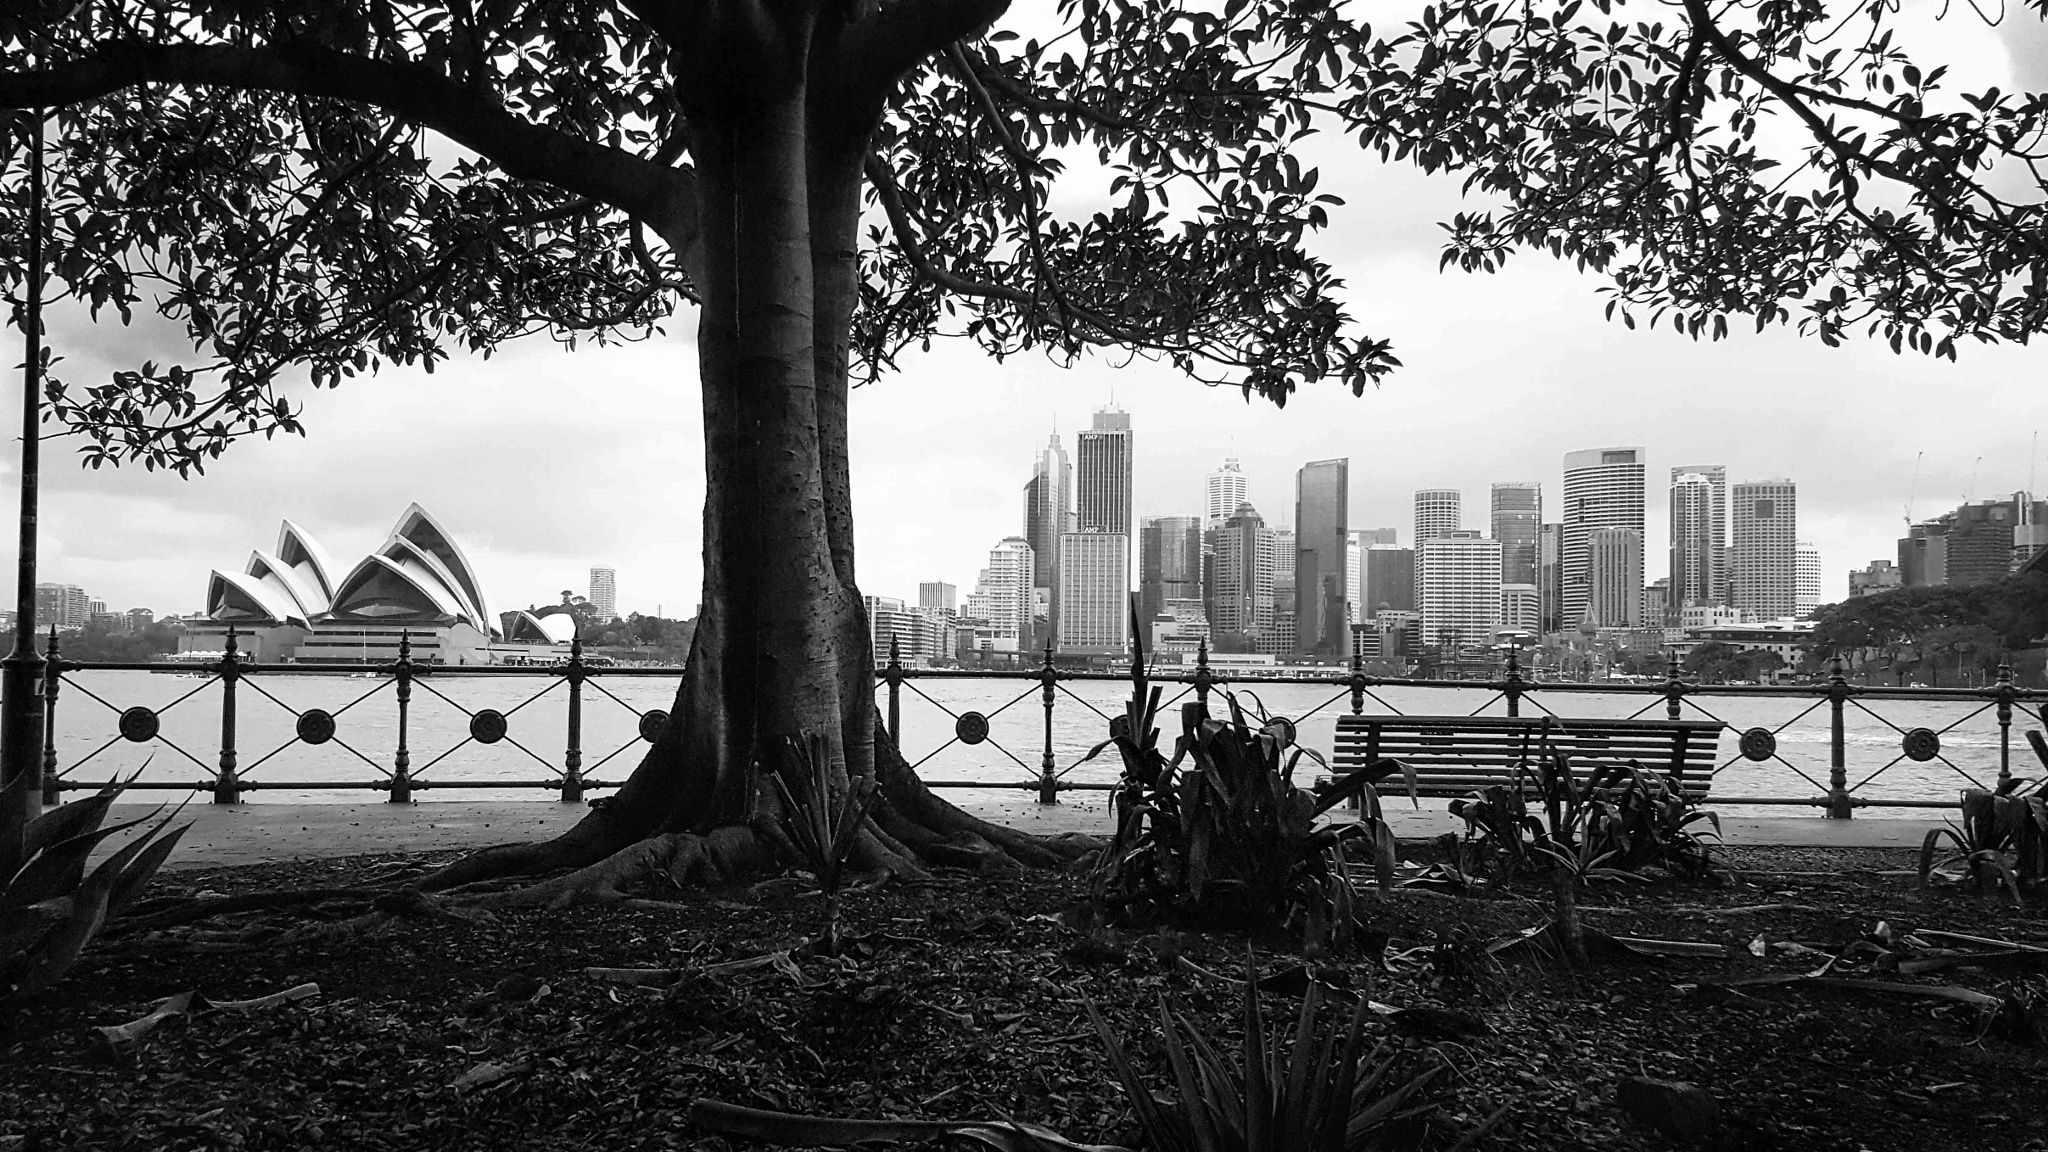 Milsons Point 2 (City) by Adam Rybka